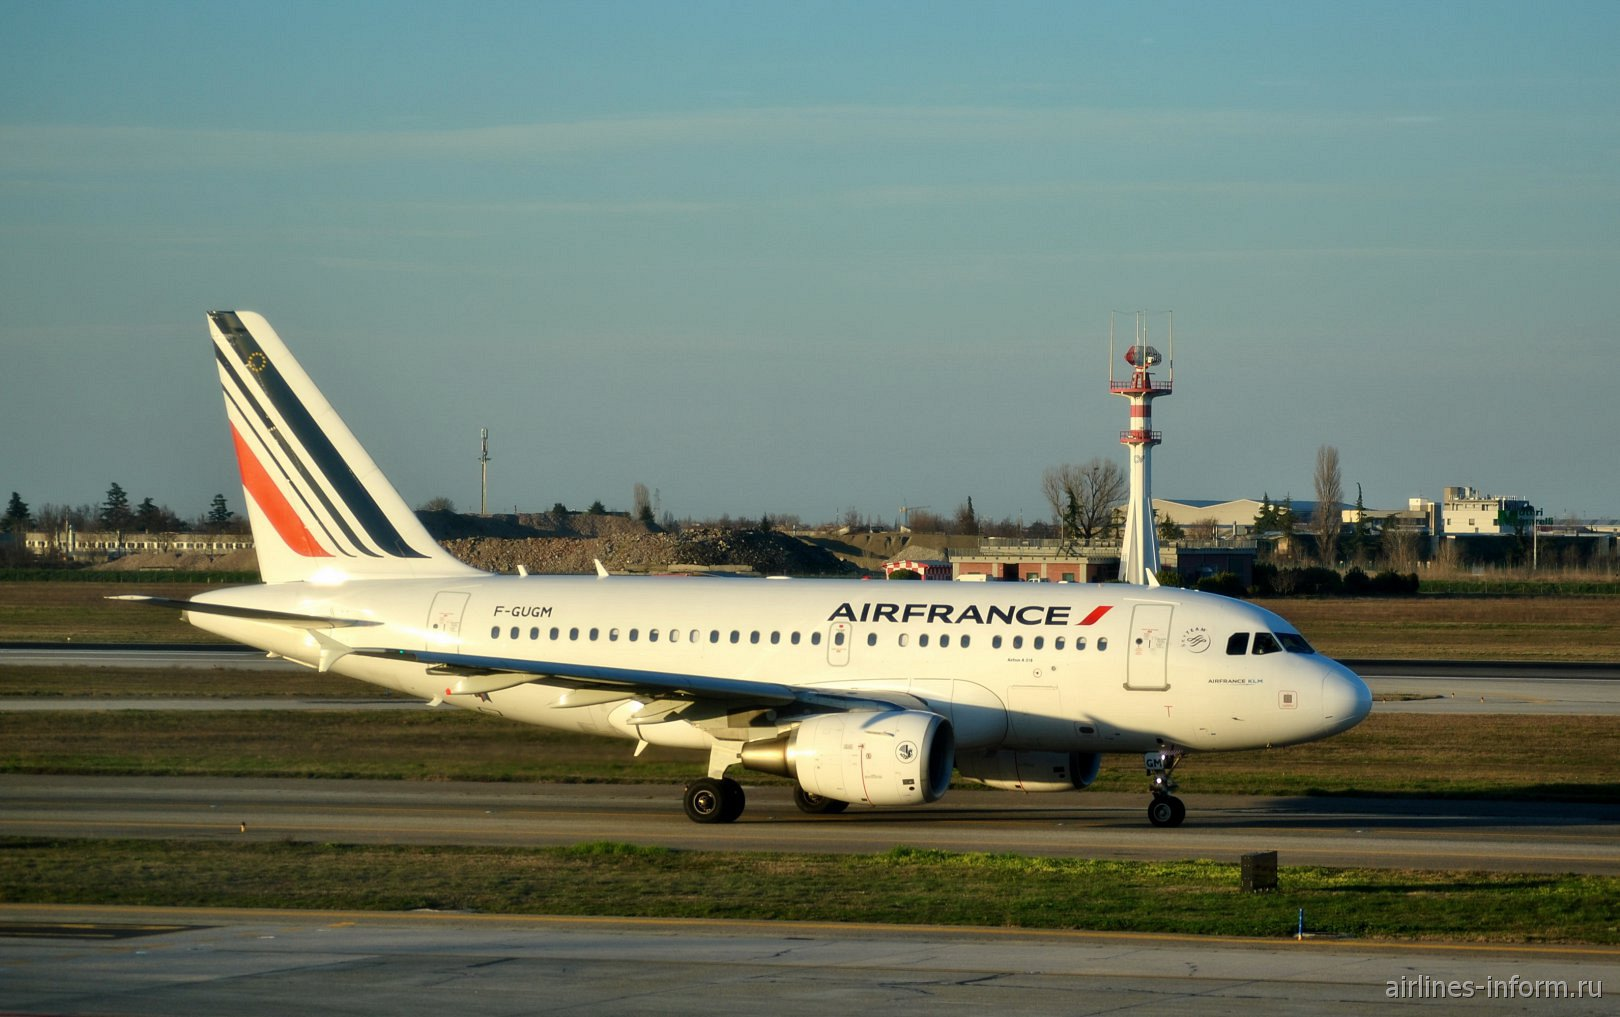 Airbus A318 F-GUGM авиакомпании Air France в аэропорту Болоньи